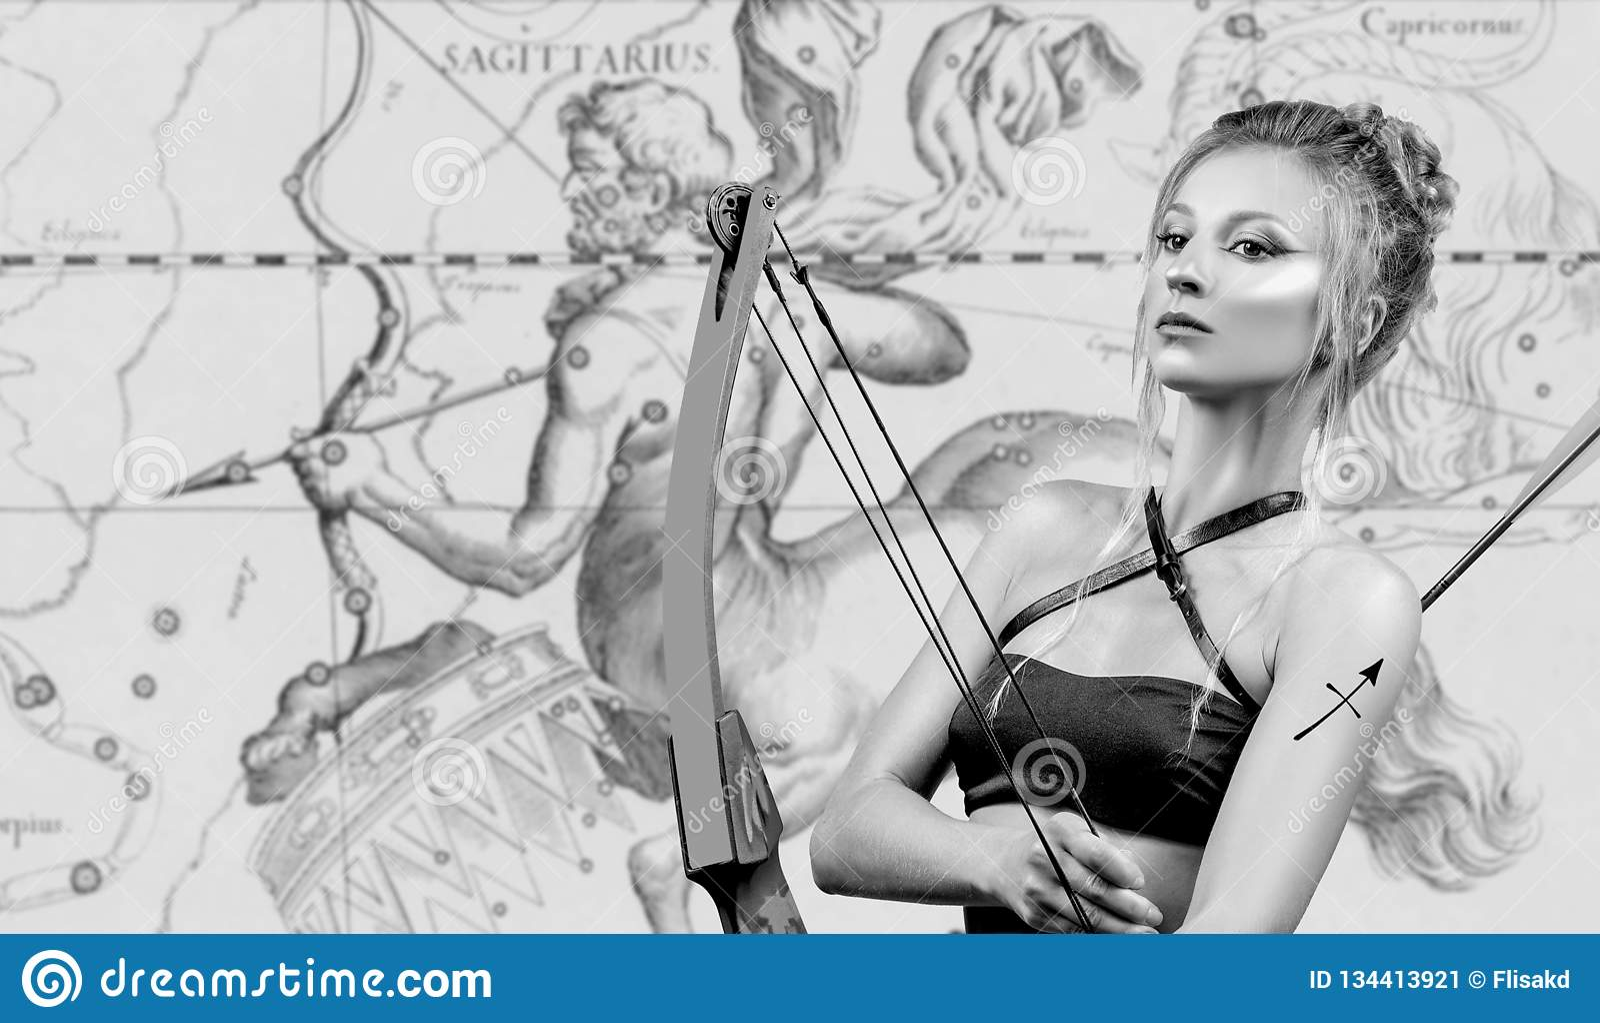 Horoscope Signe de zodiaque de Sagittaire, beau Sagittaire de femme sur la carte de zodiaque